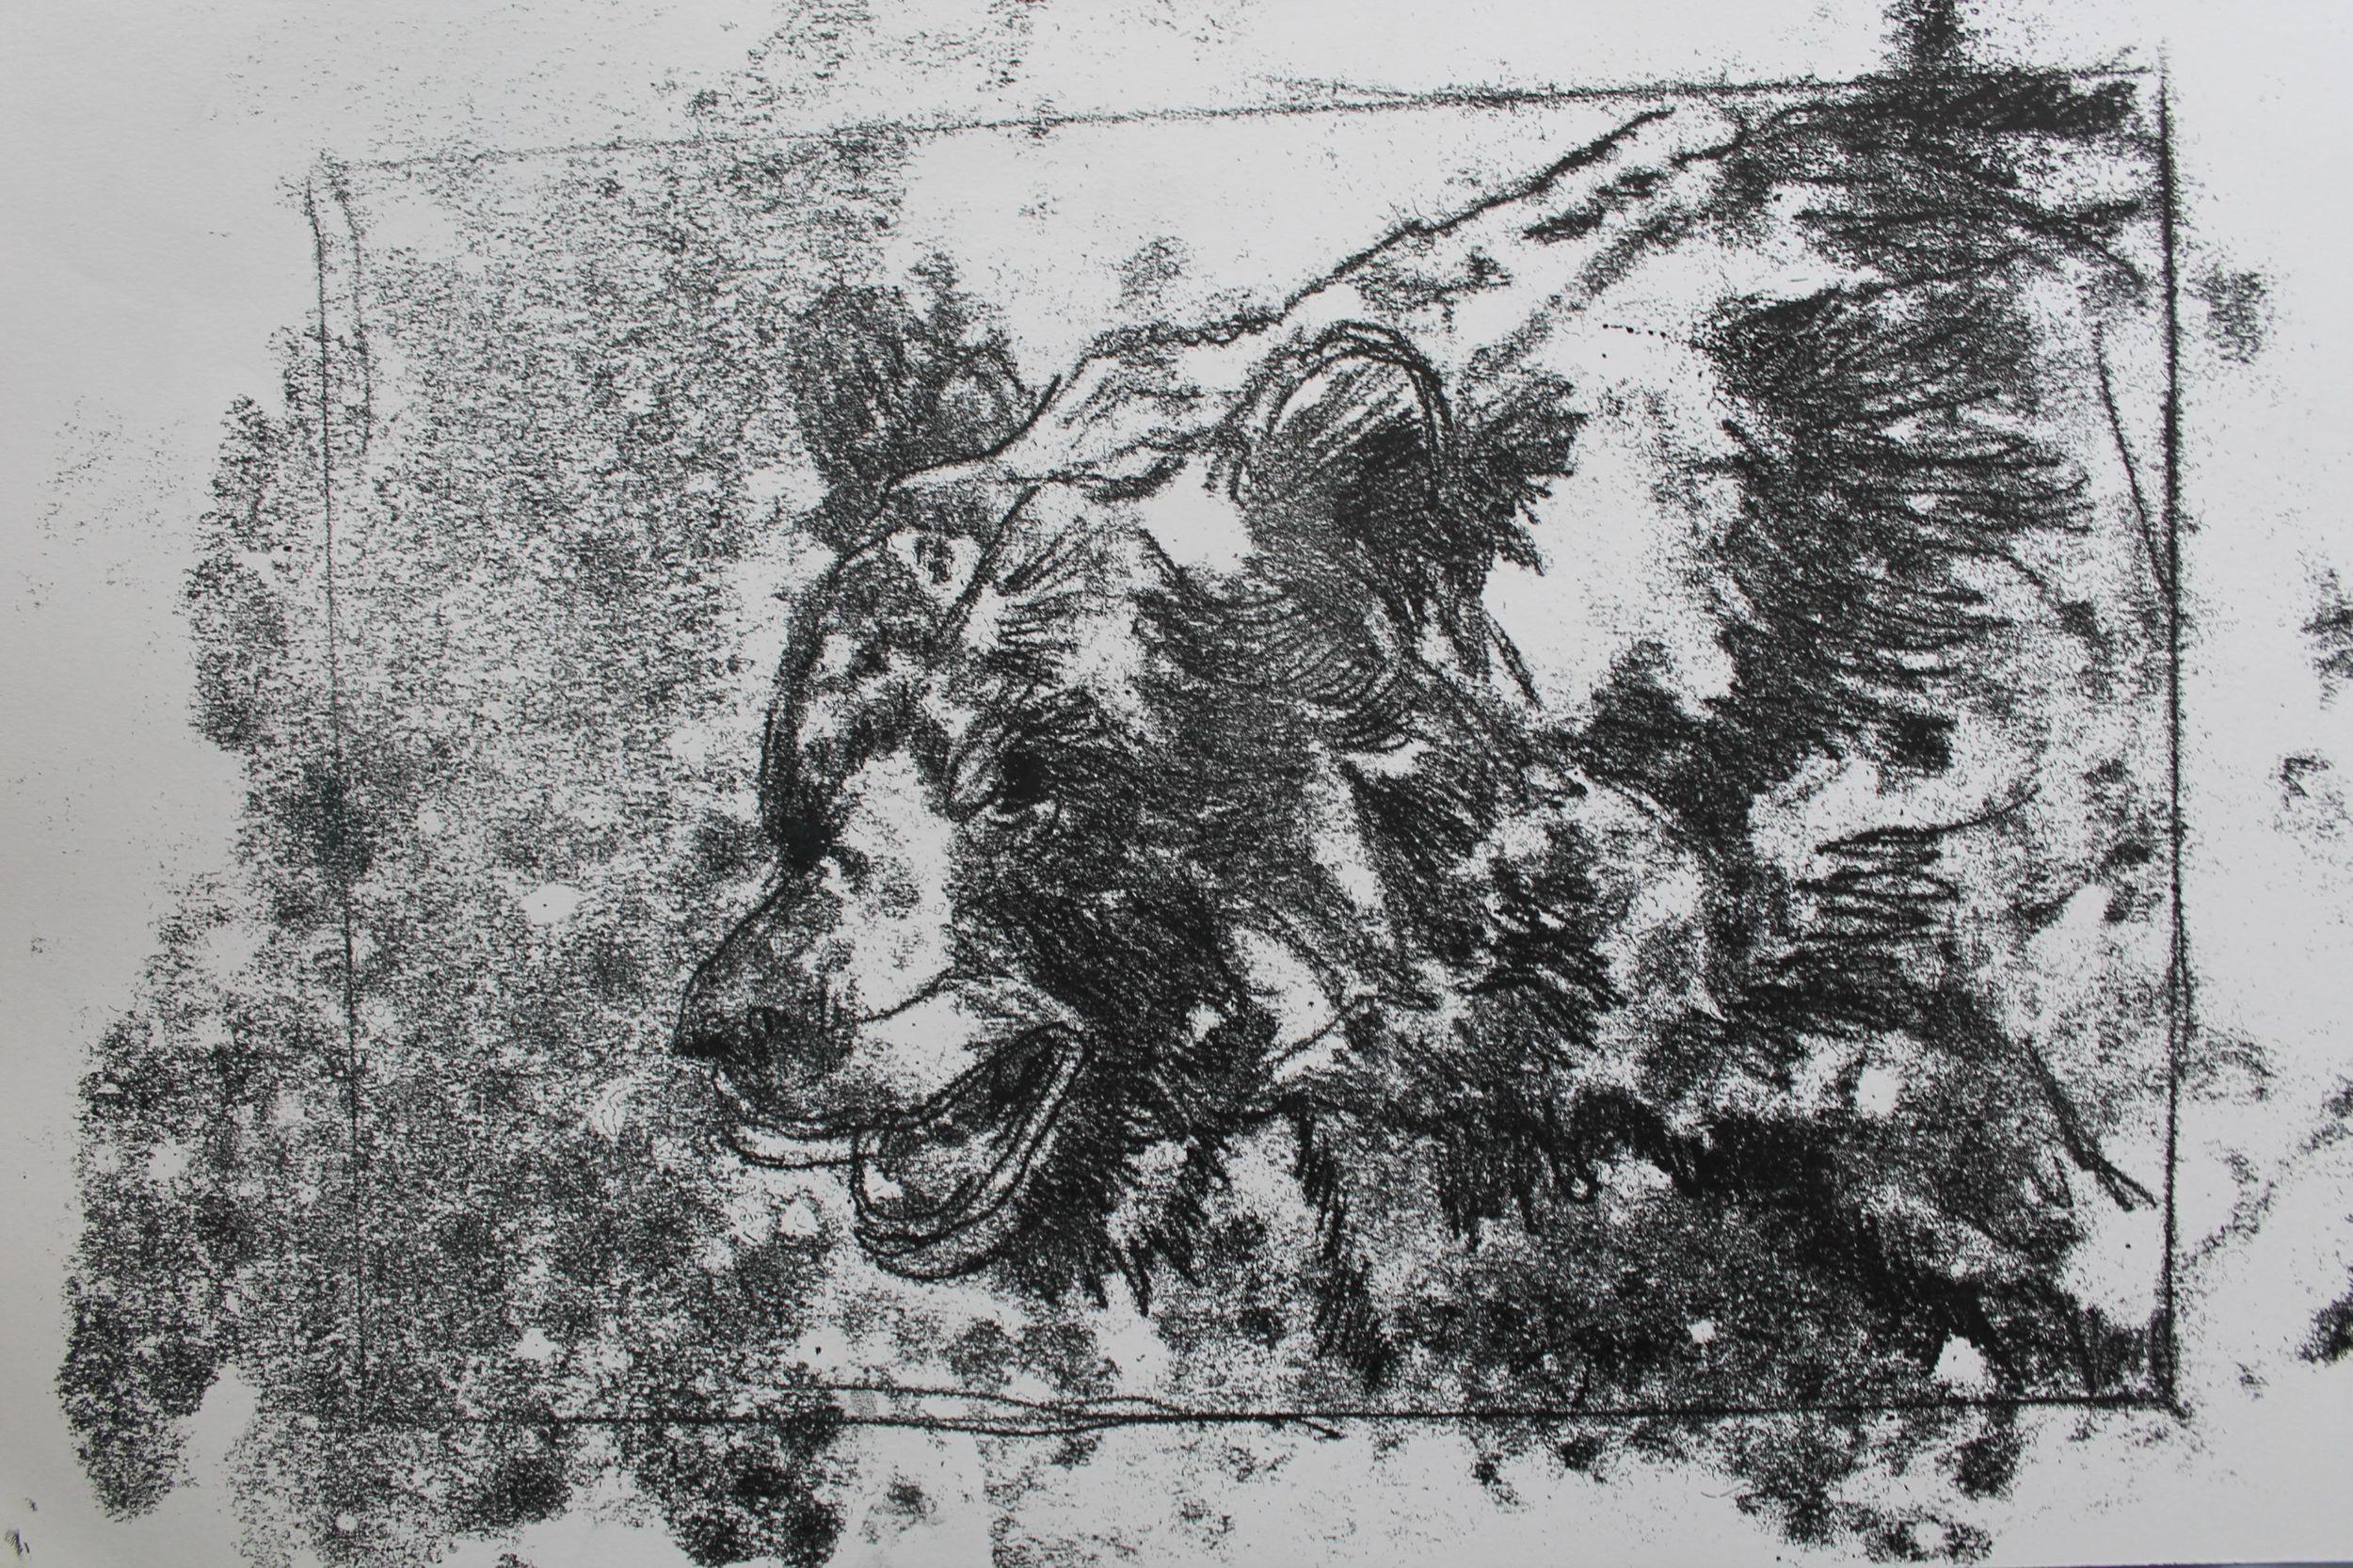 Bear monoprint 1